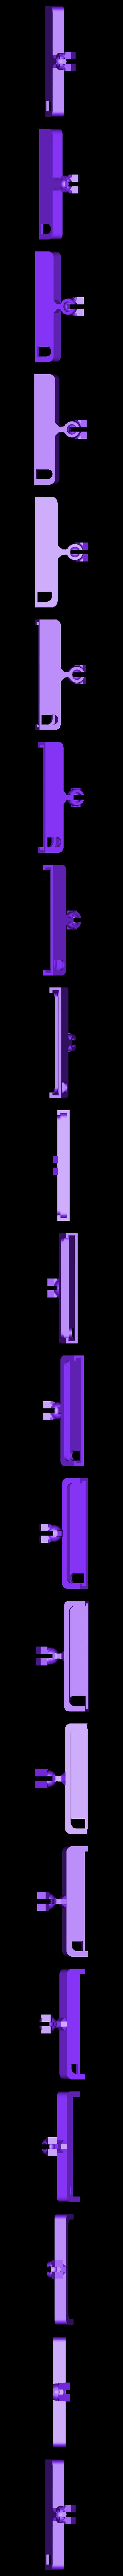 Porte_Iphone_rotule.STL Download free STL file Iphone holder for Cage modular DSLR • Design to 3D print, vanson